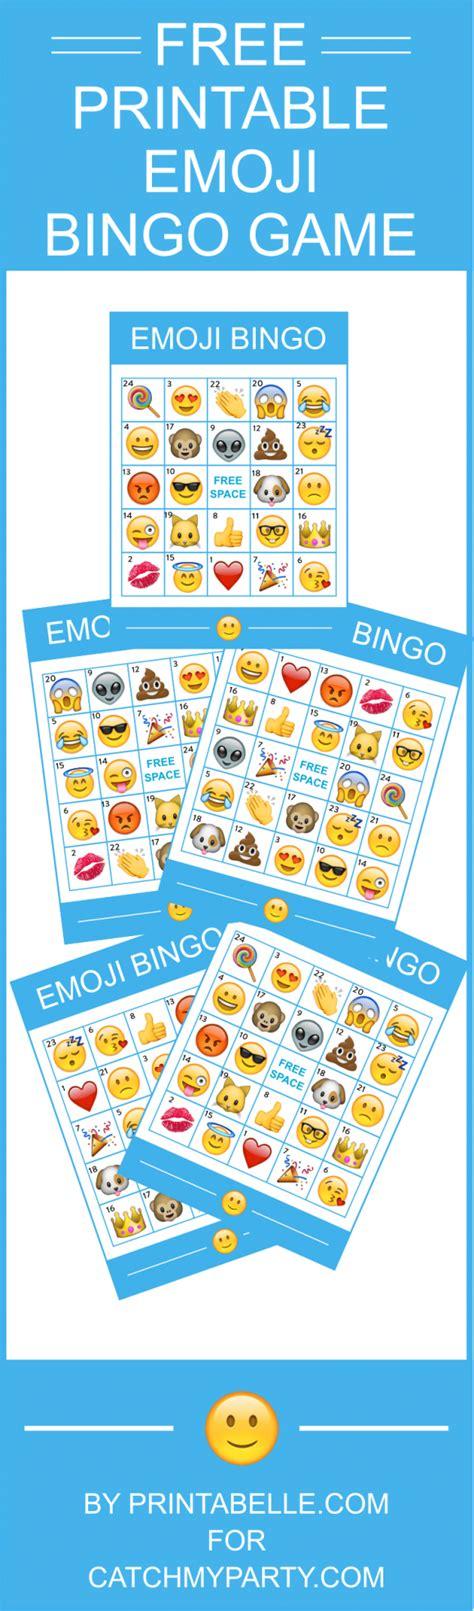 printable games bingo free printable emoji bingo game comes with 8 bingo